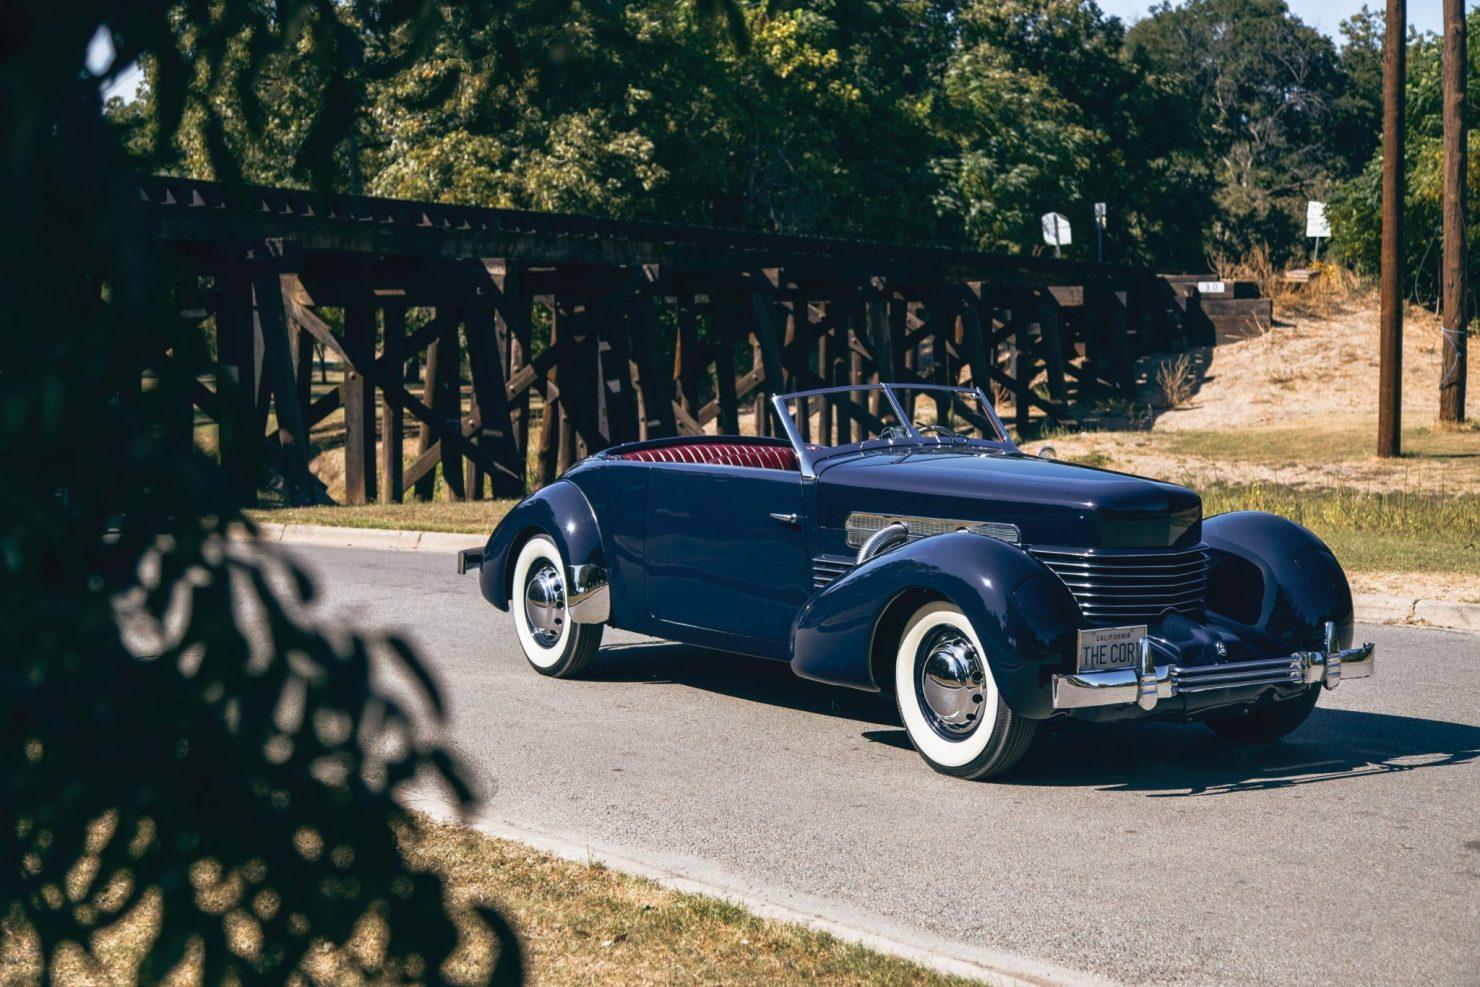 cord 812 supercharged phaeton 1 1480x987 - 1937 Cord 812 Supercharged Phaeton